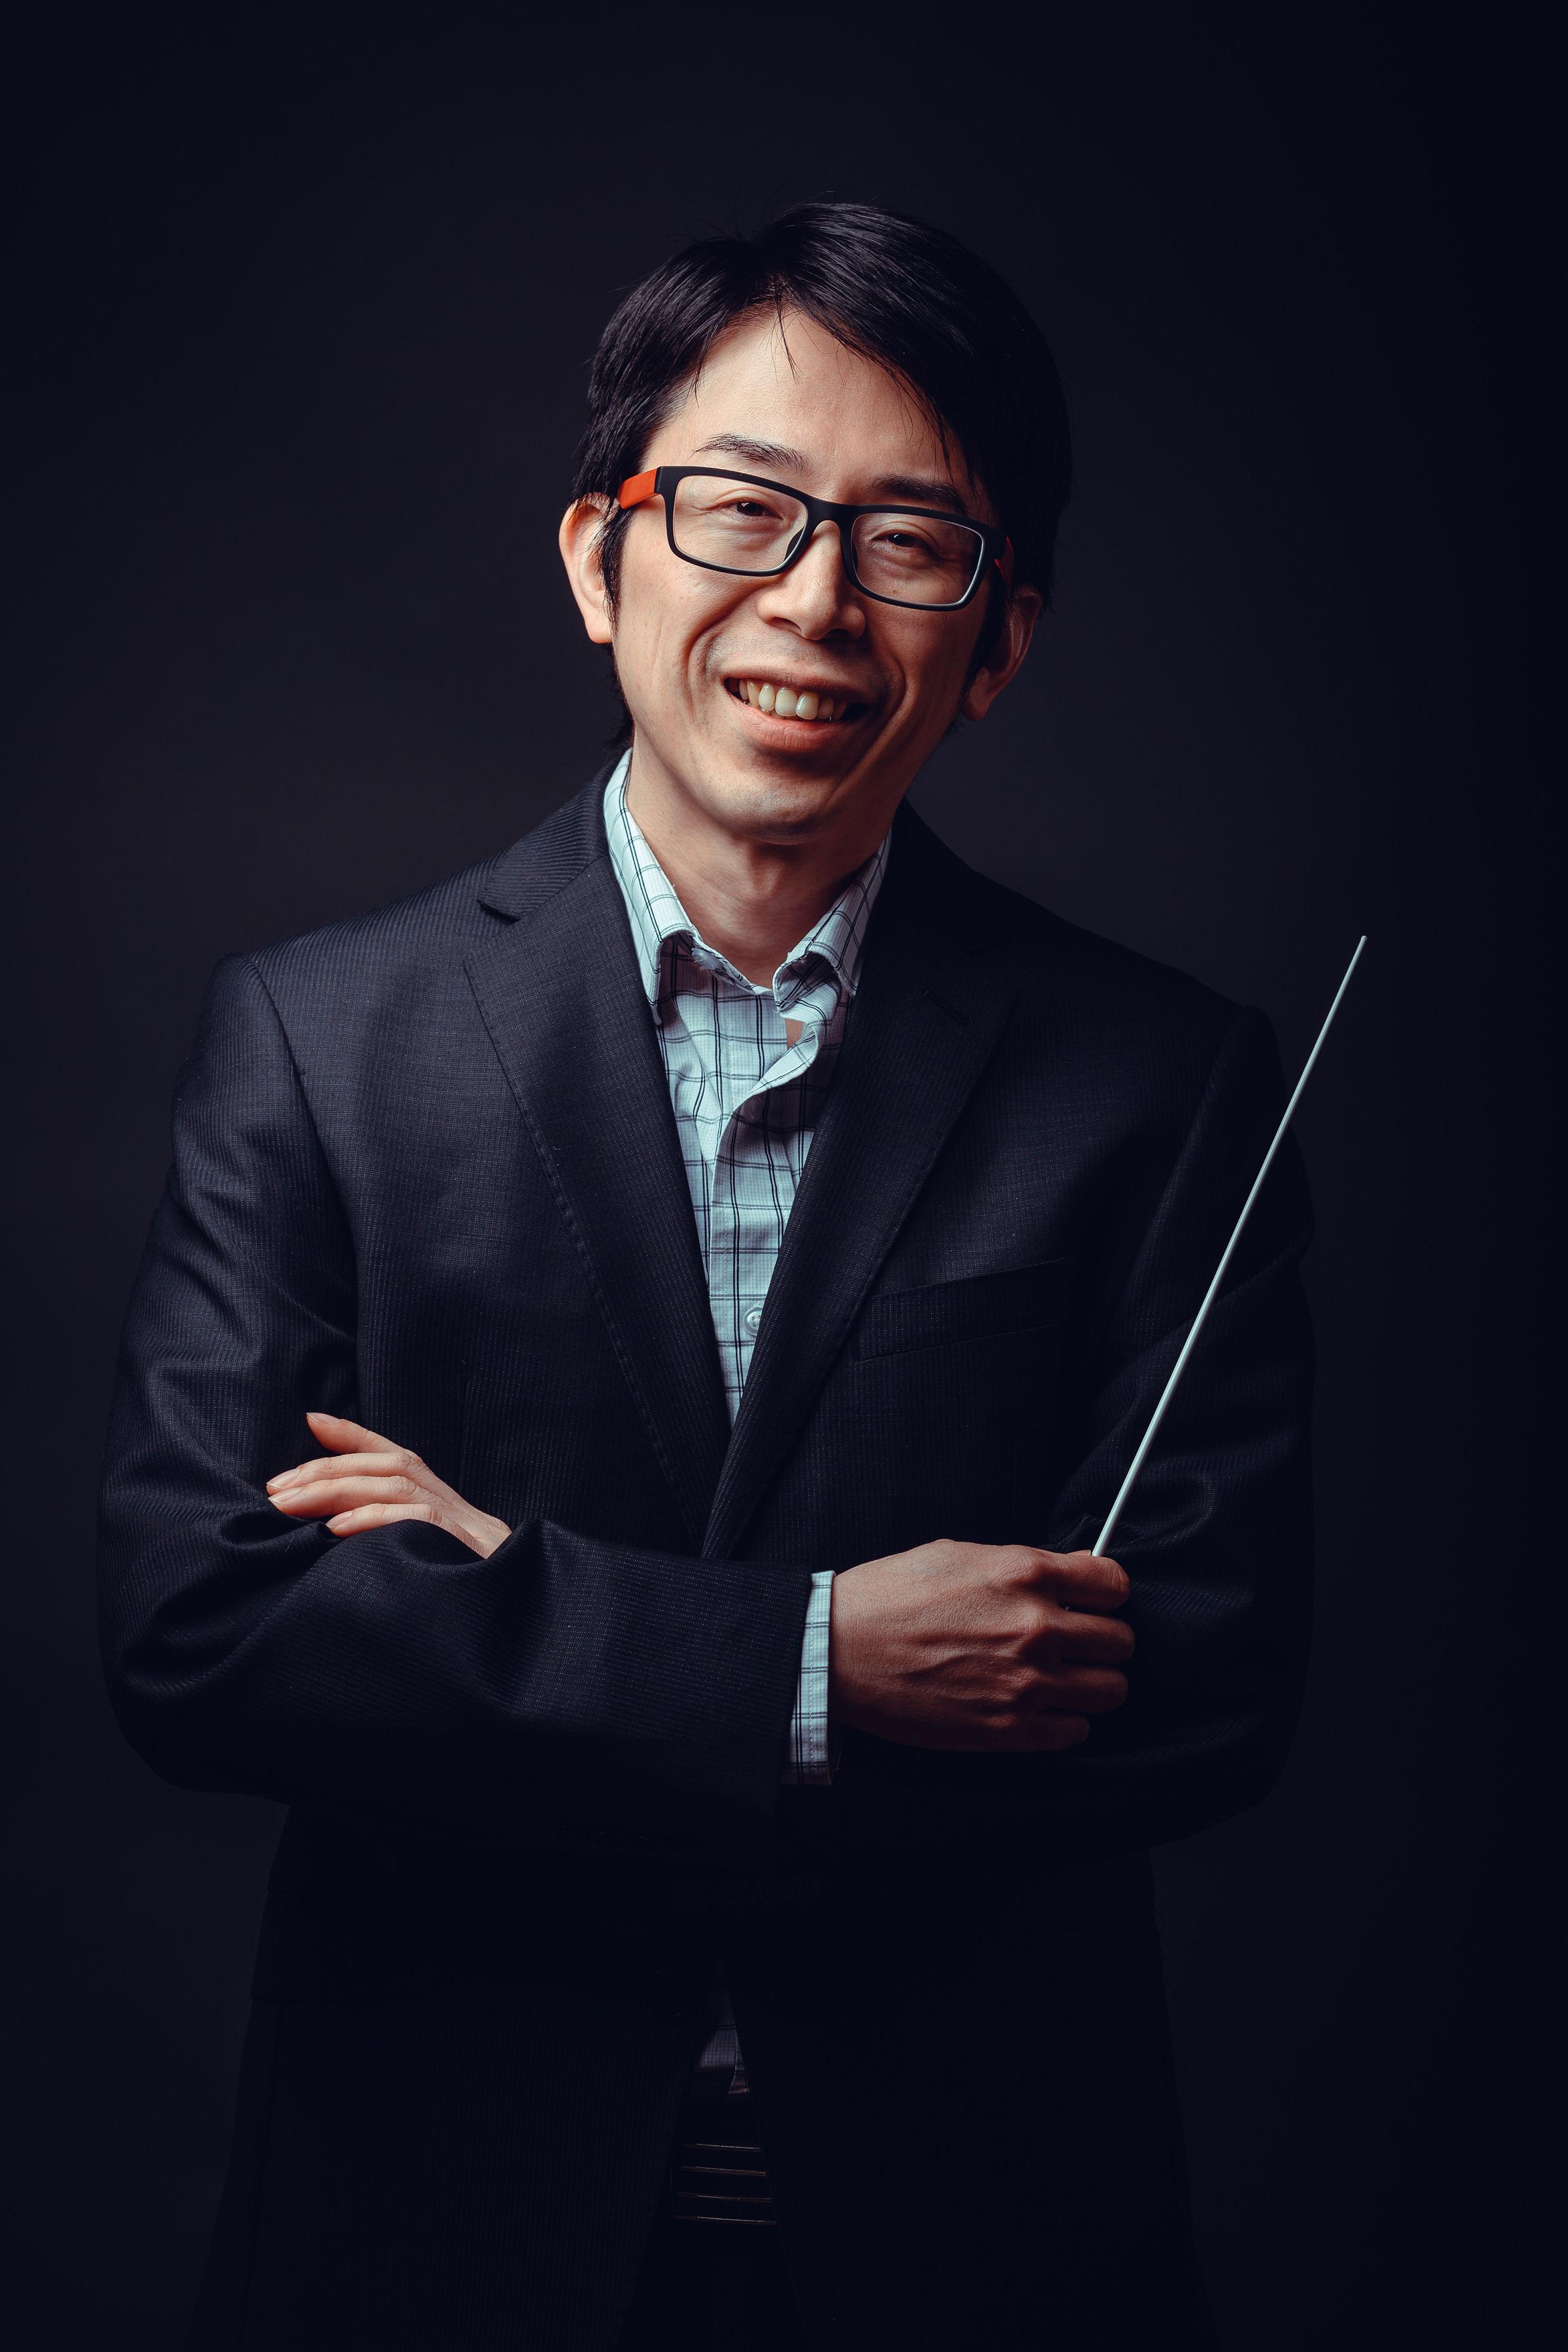 Photo of Yohei Sakai, Artistic Director